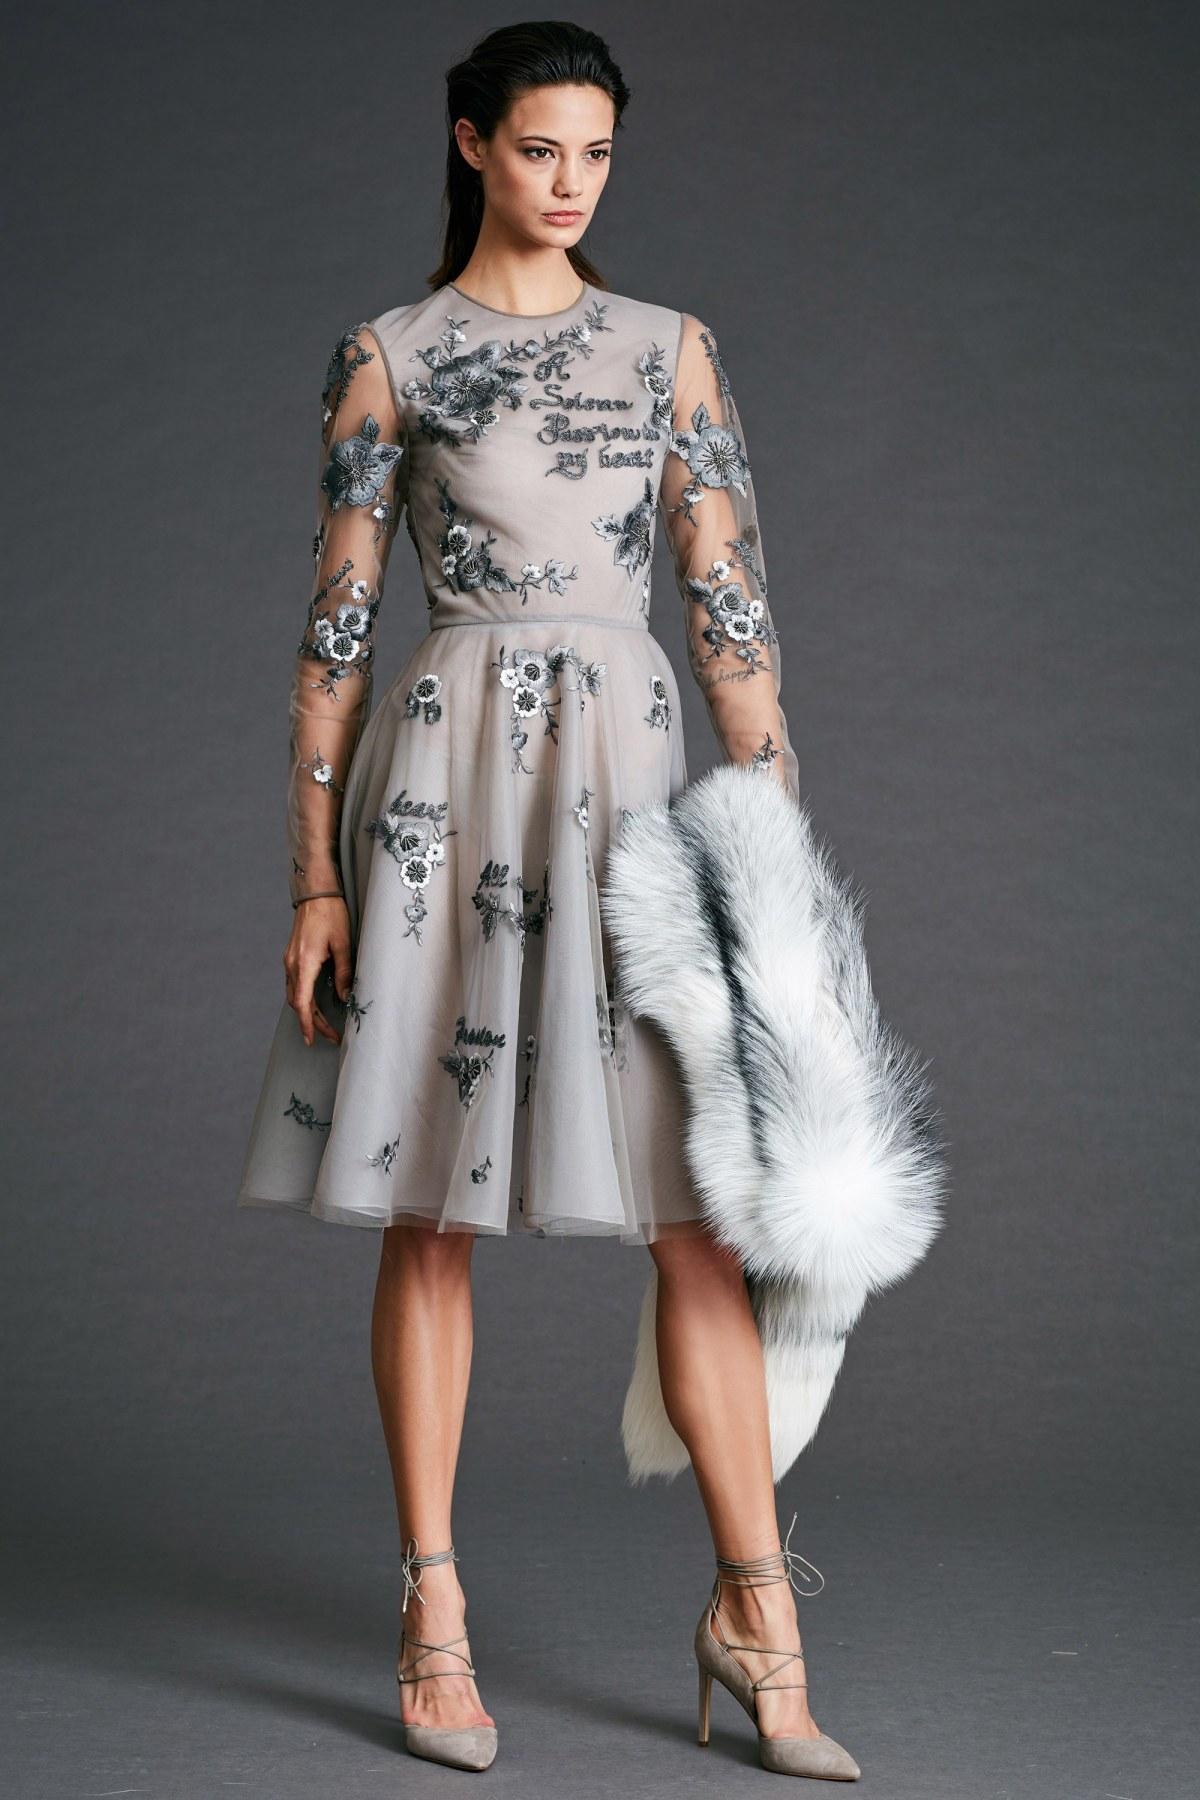 dennis-basso-pre-fall-2017-fashion-show-the-impression-18